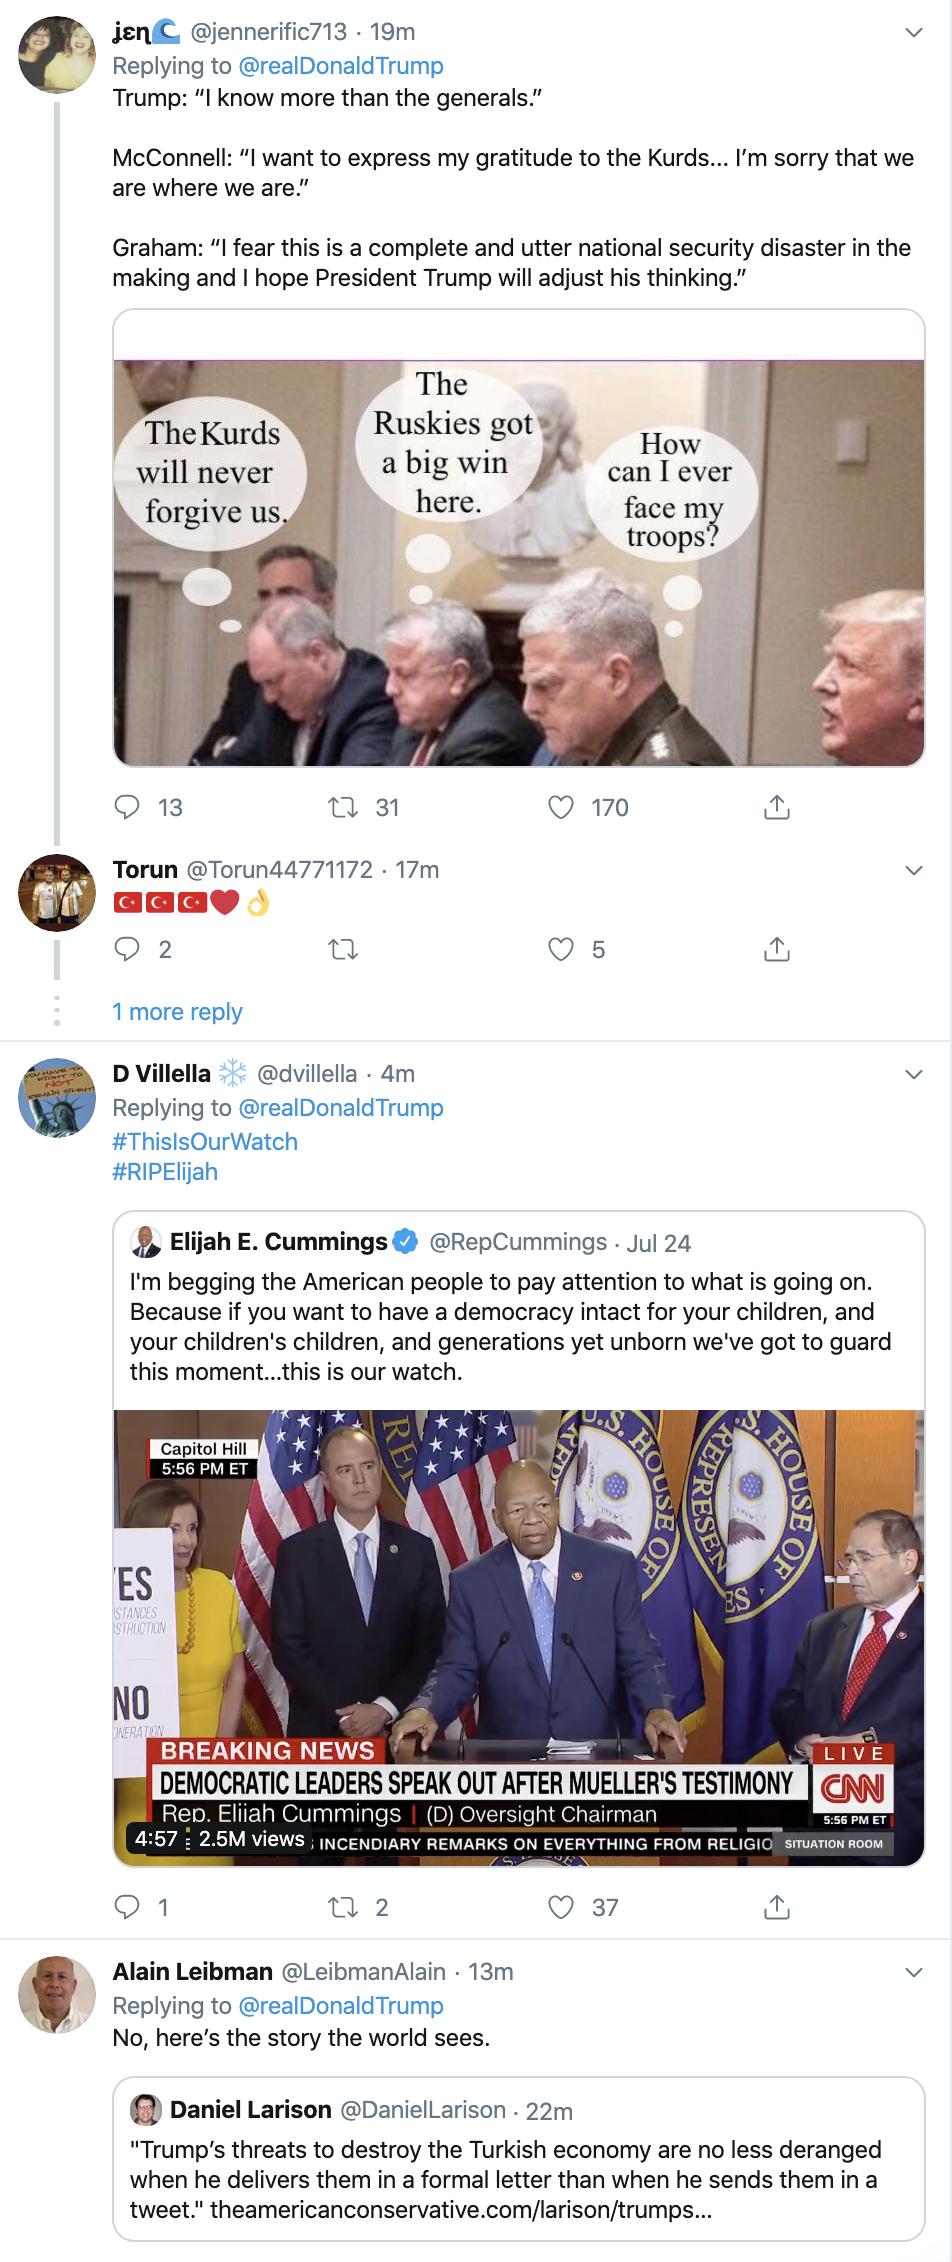 Screen-Shot-2019-10-17-at-7.14.52-AM Trump Has Thursday Morning Multi-Tweet Elijah Cummings Meltdown Corruption Crime Domestic Policy Donald Trump Election 2016 Election 2020 Featured Media Politics Television Top Stories